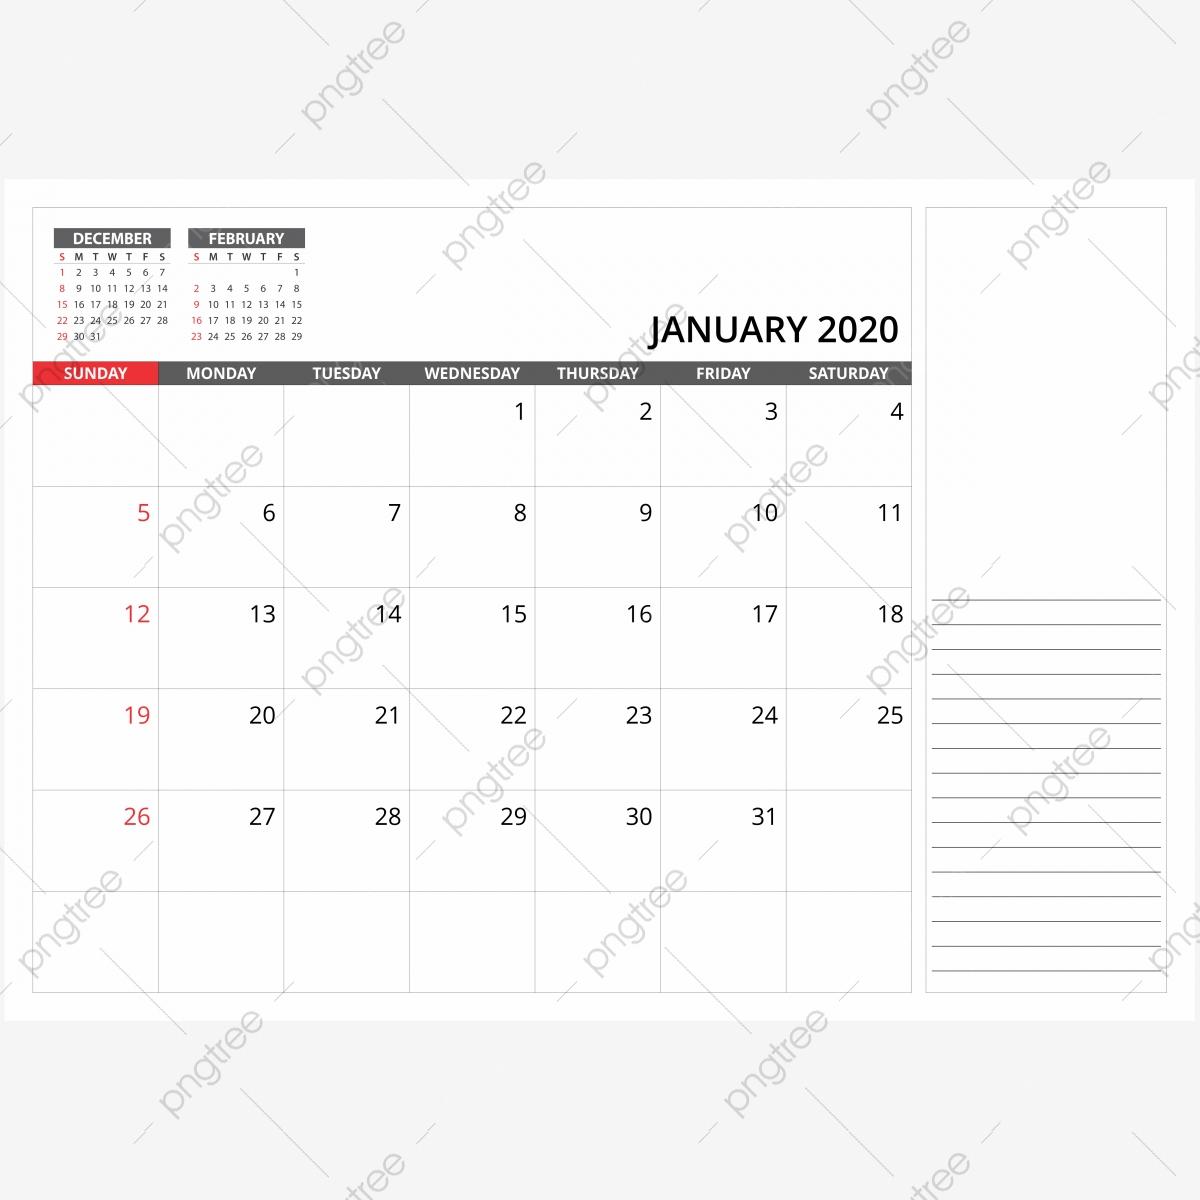 January 2020 Monthly Desk Calendar, 2020, Calendar, Png Png